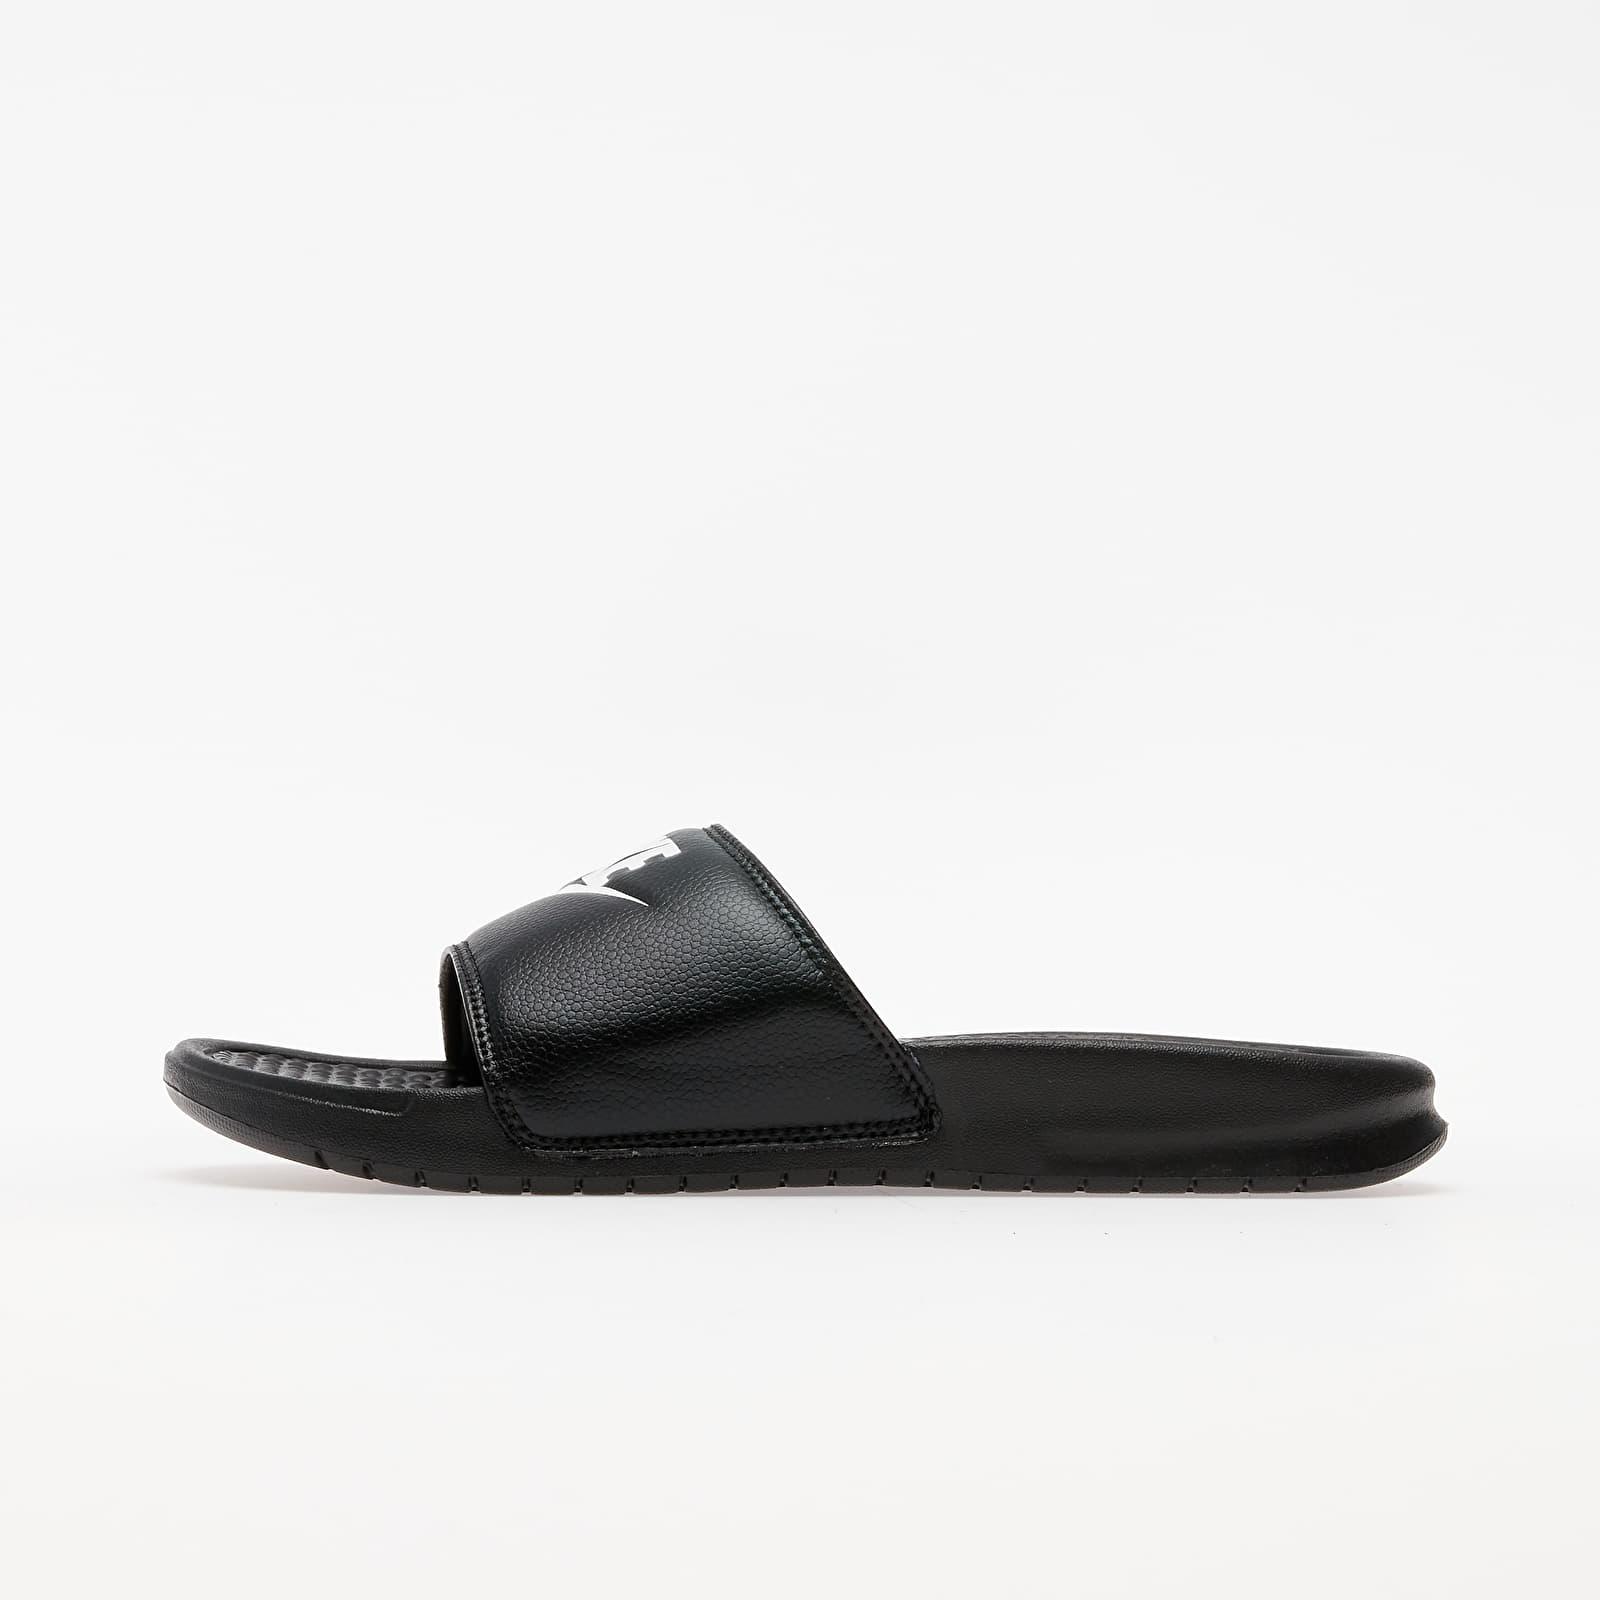 Chaussures et baskets homme Nike Benassi Jdi Black/ White